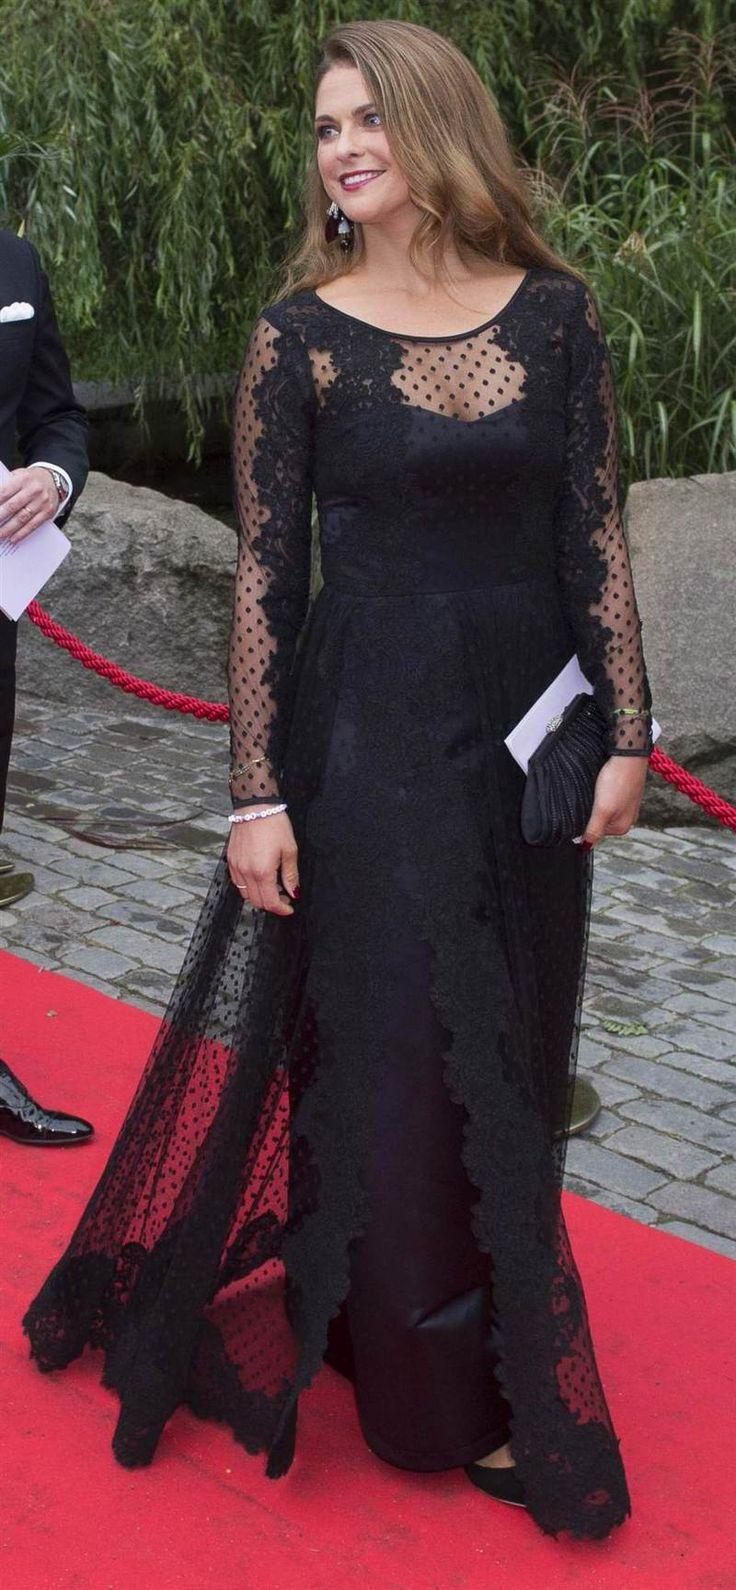 Princess Madeleine of Sweden attended the World Childhood Foundation banquet 9/8/14